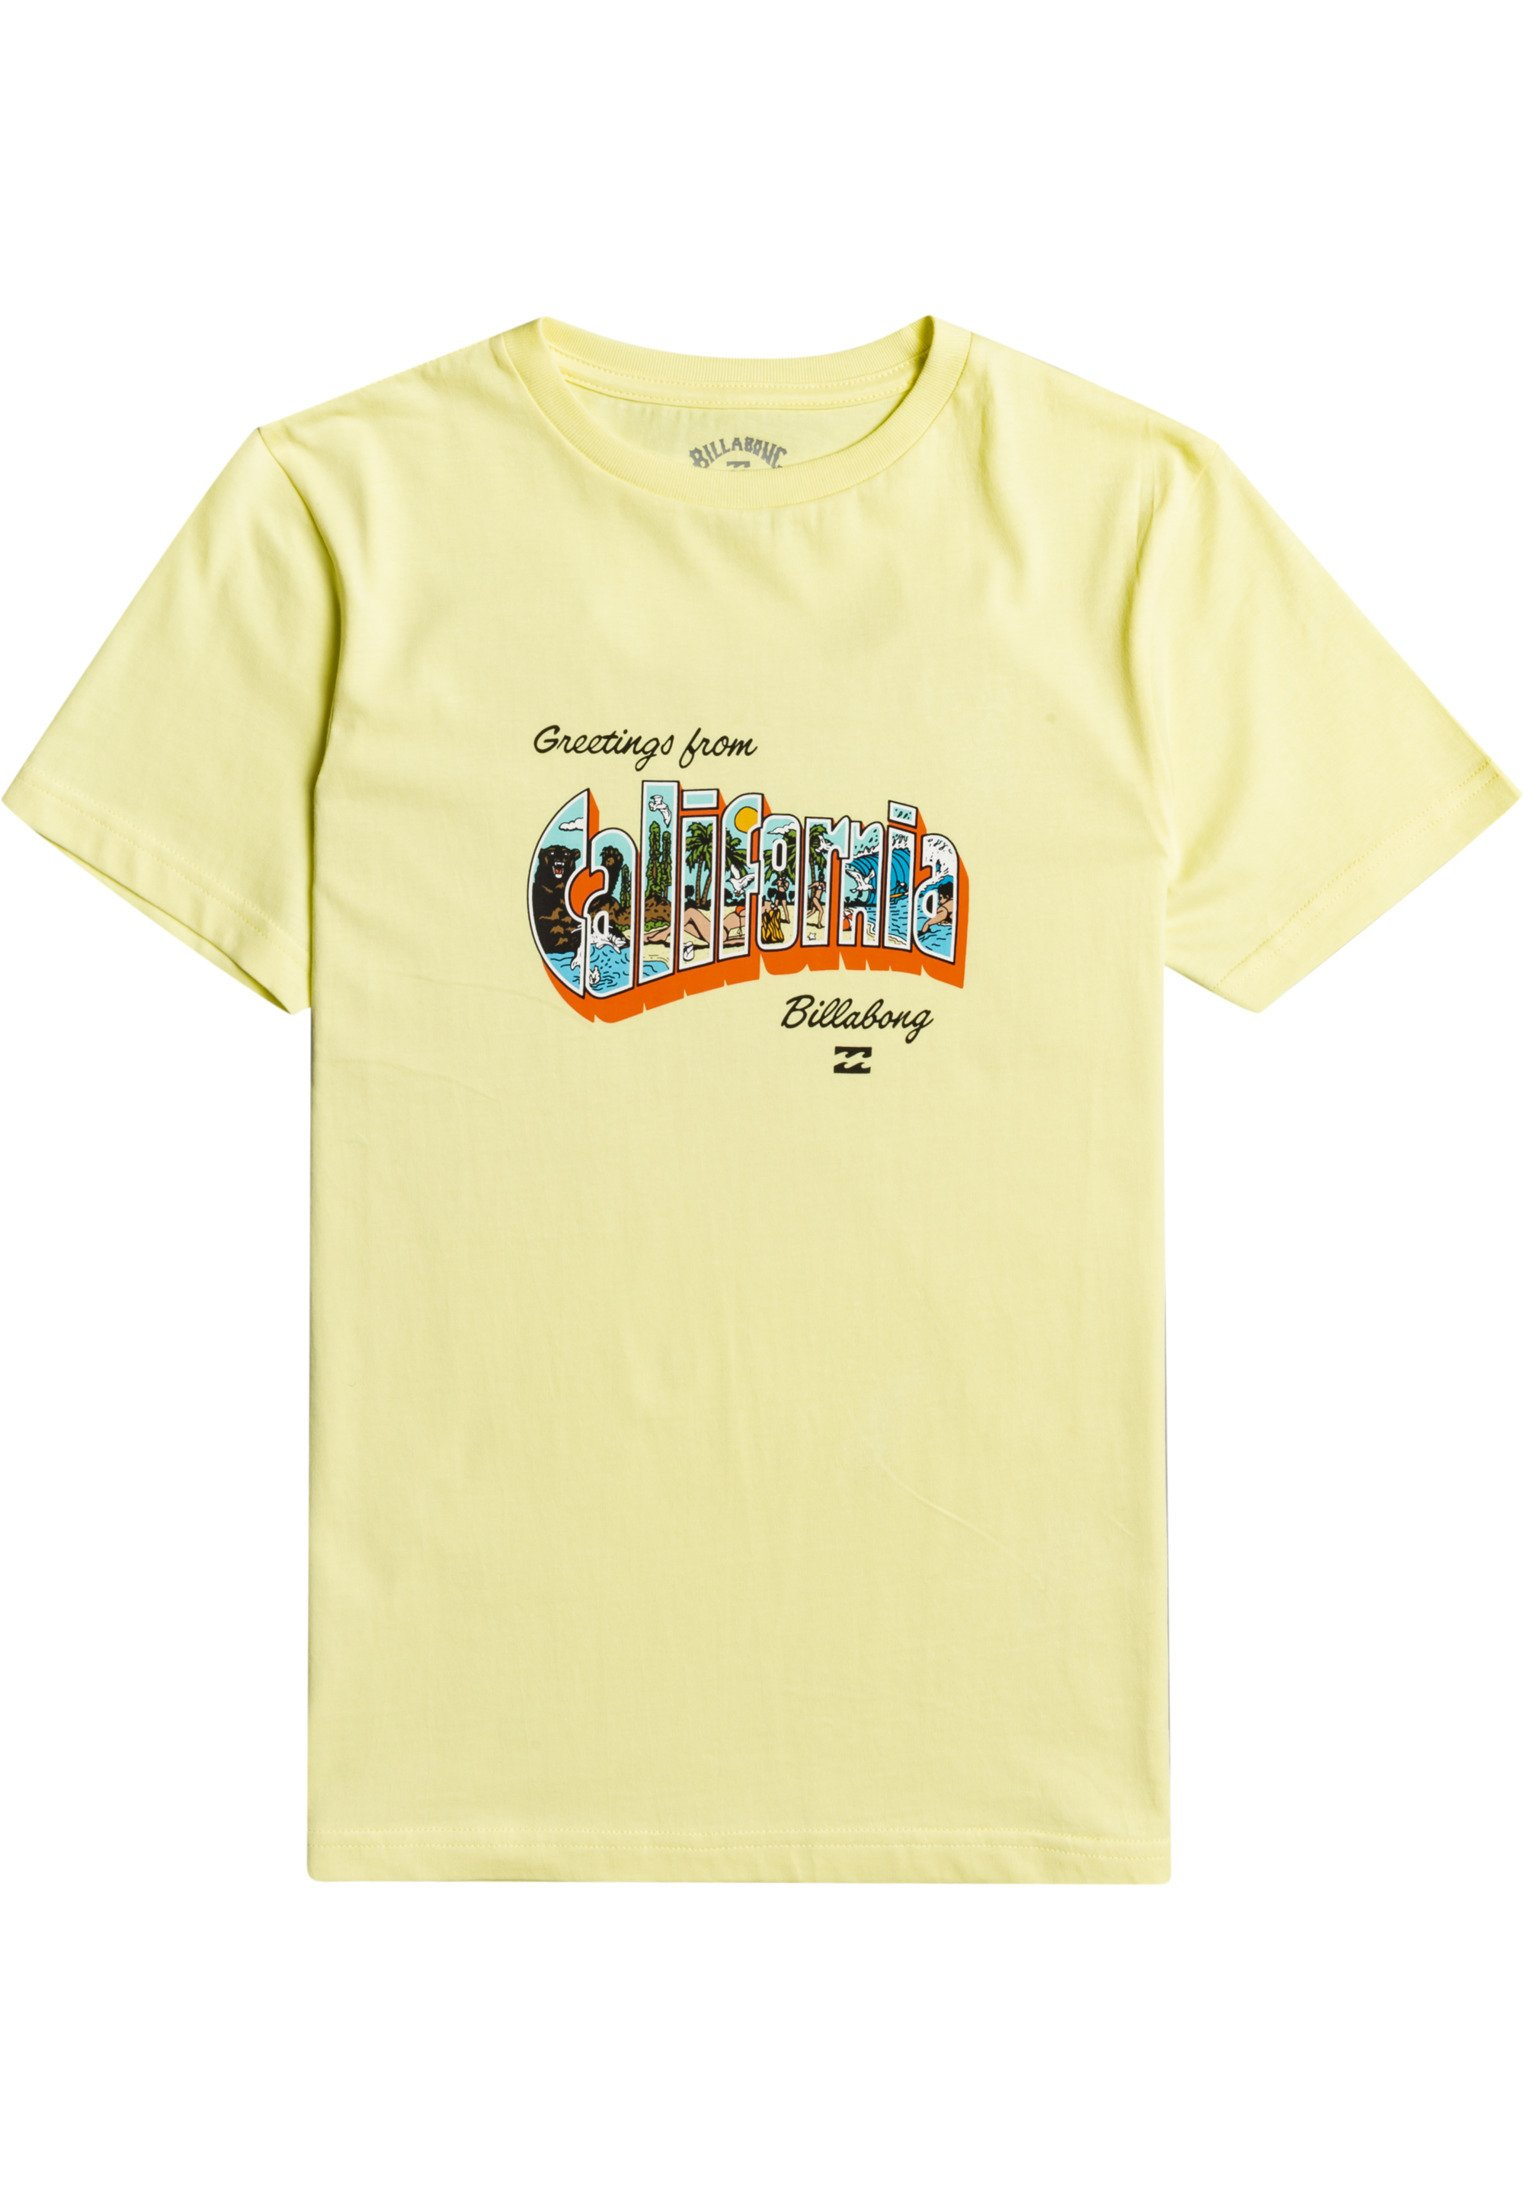 Niño GREETINGS - Camiseta de lycra/neopreno